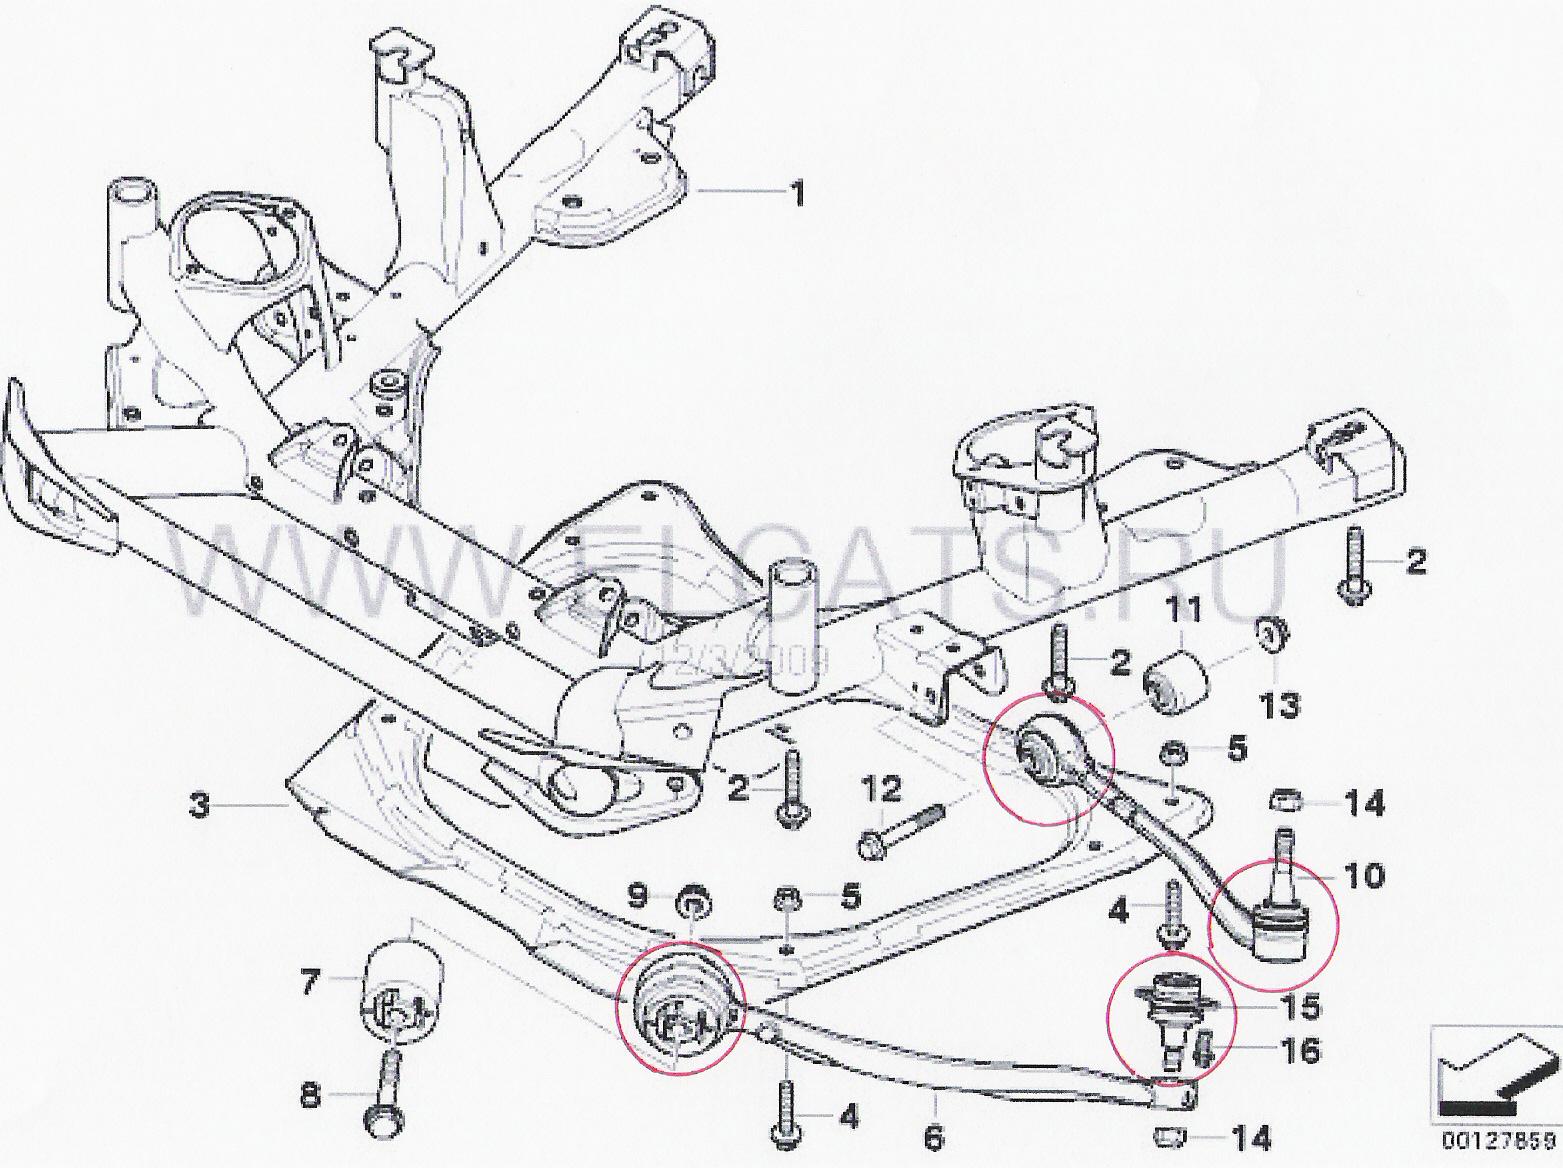 Передняя подвеска carina e схема